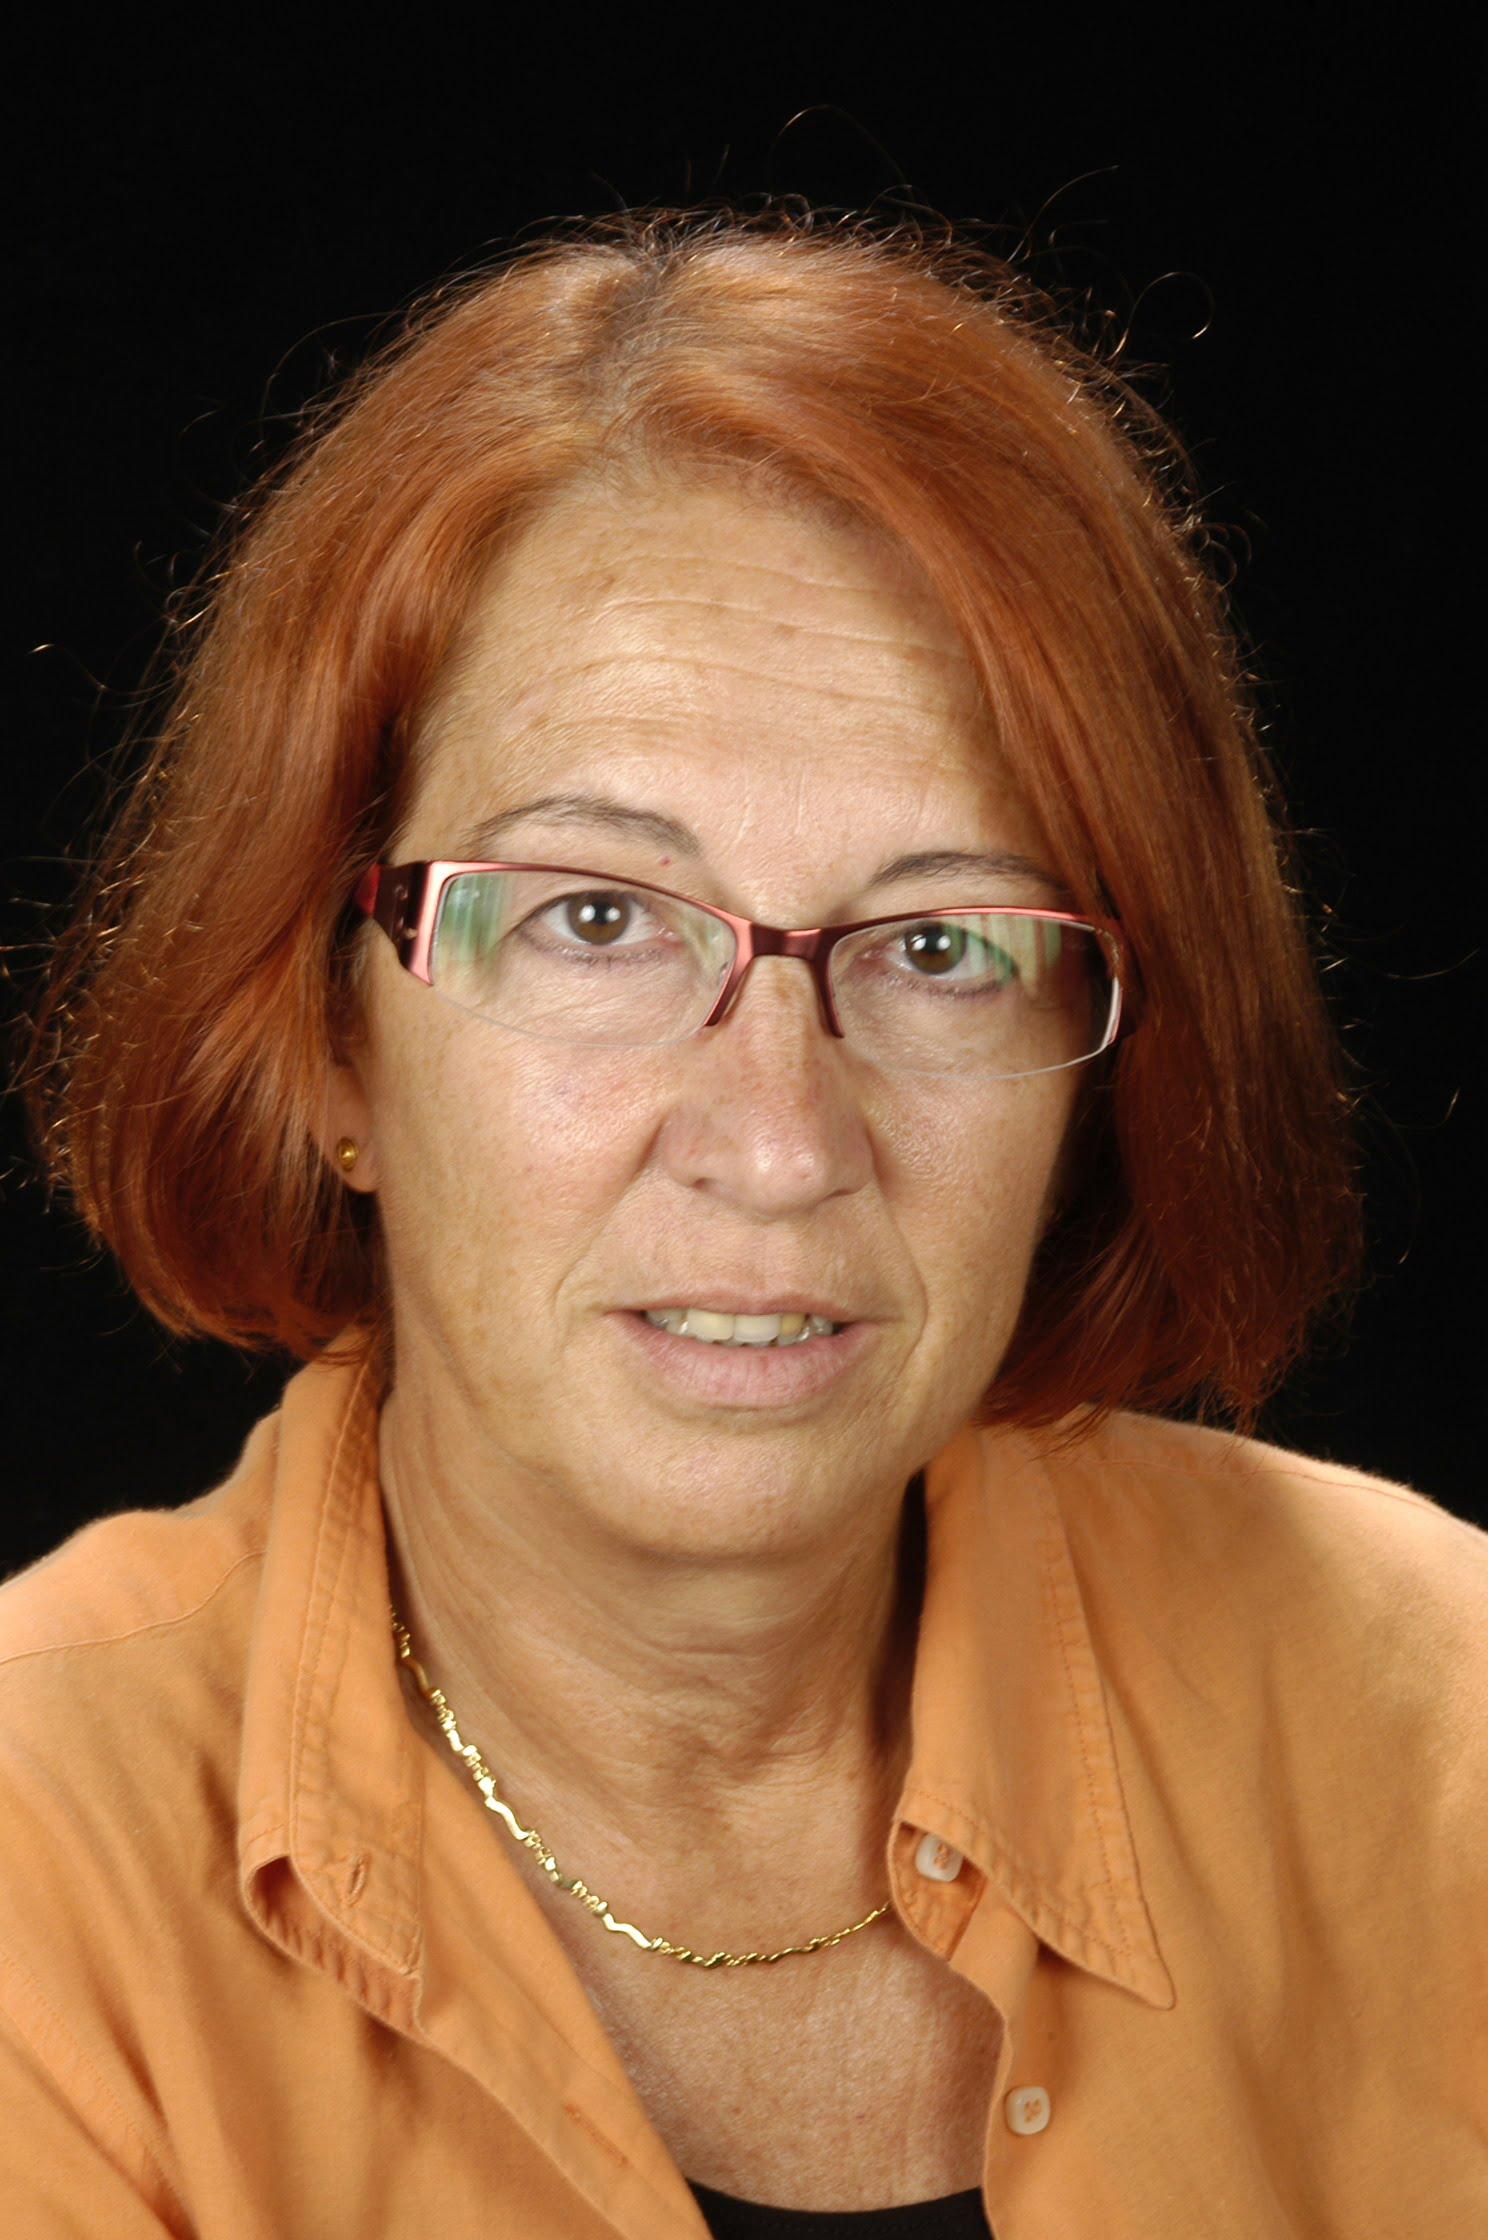 Dra. Guadalupe Mengod Los Arcos